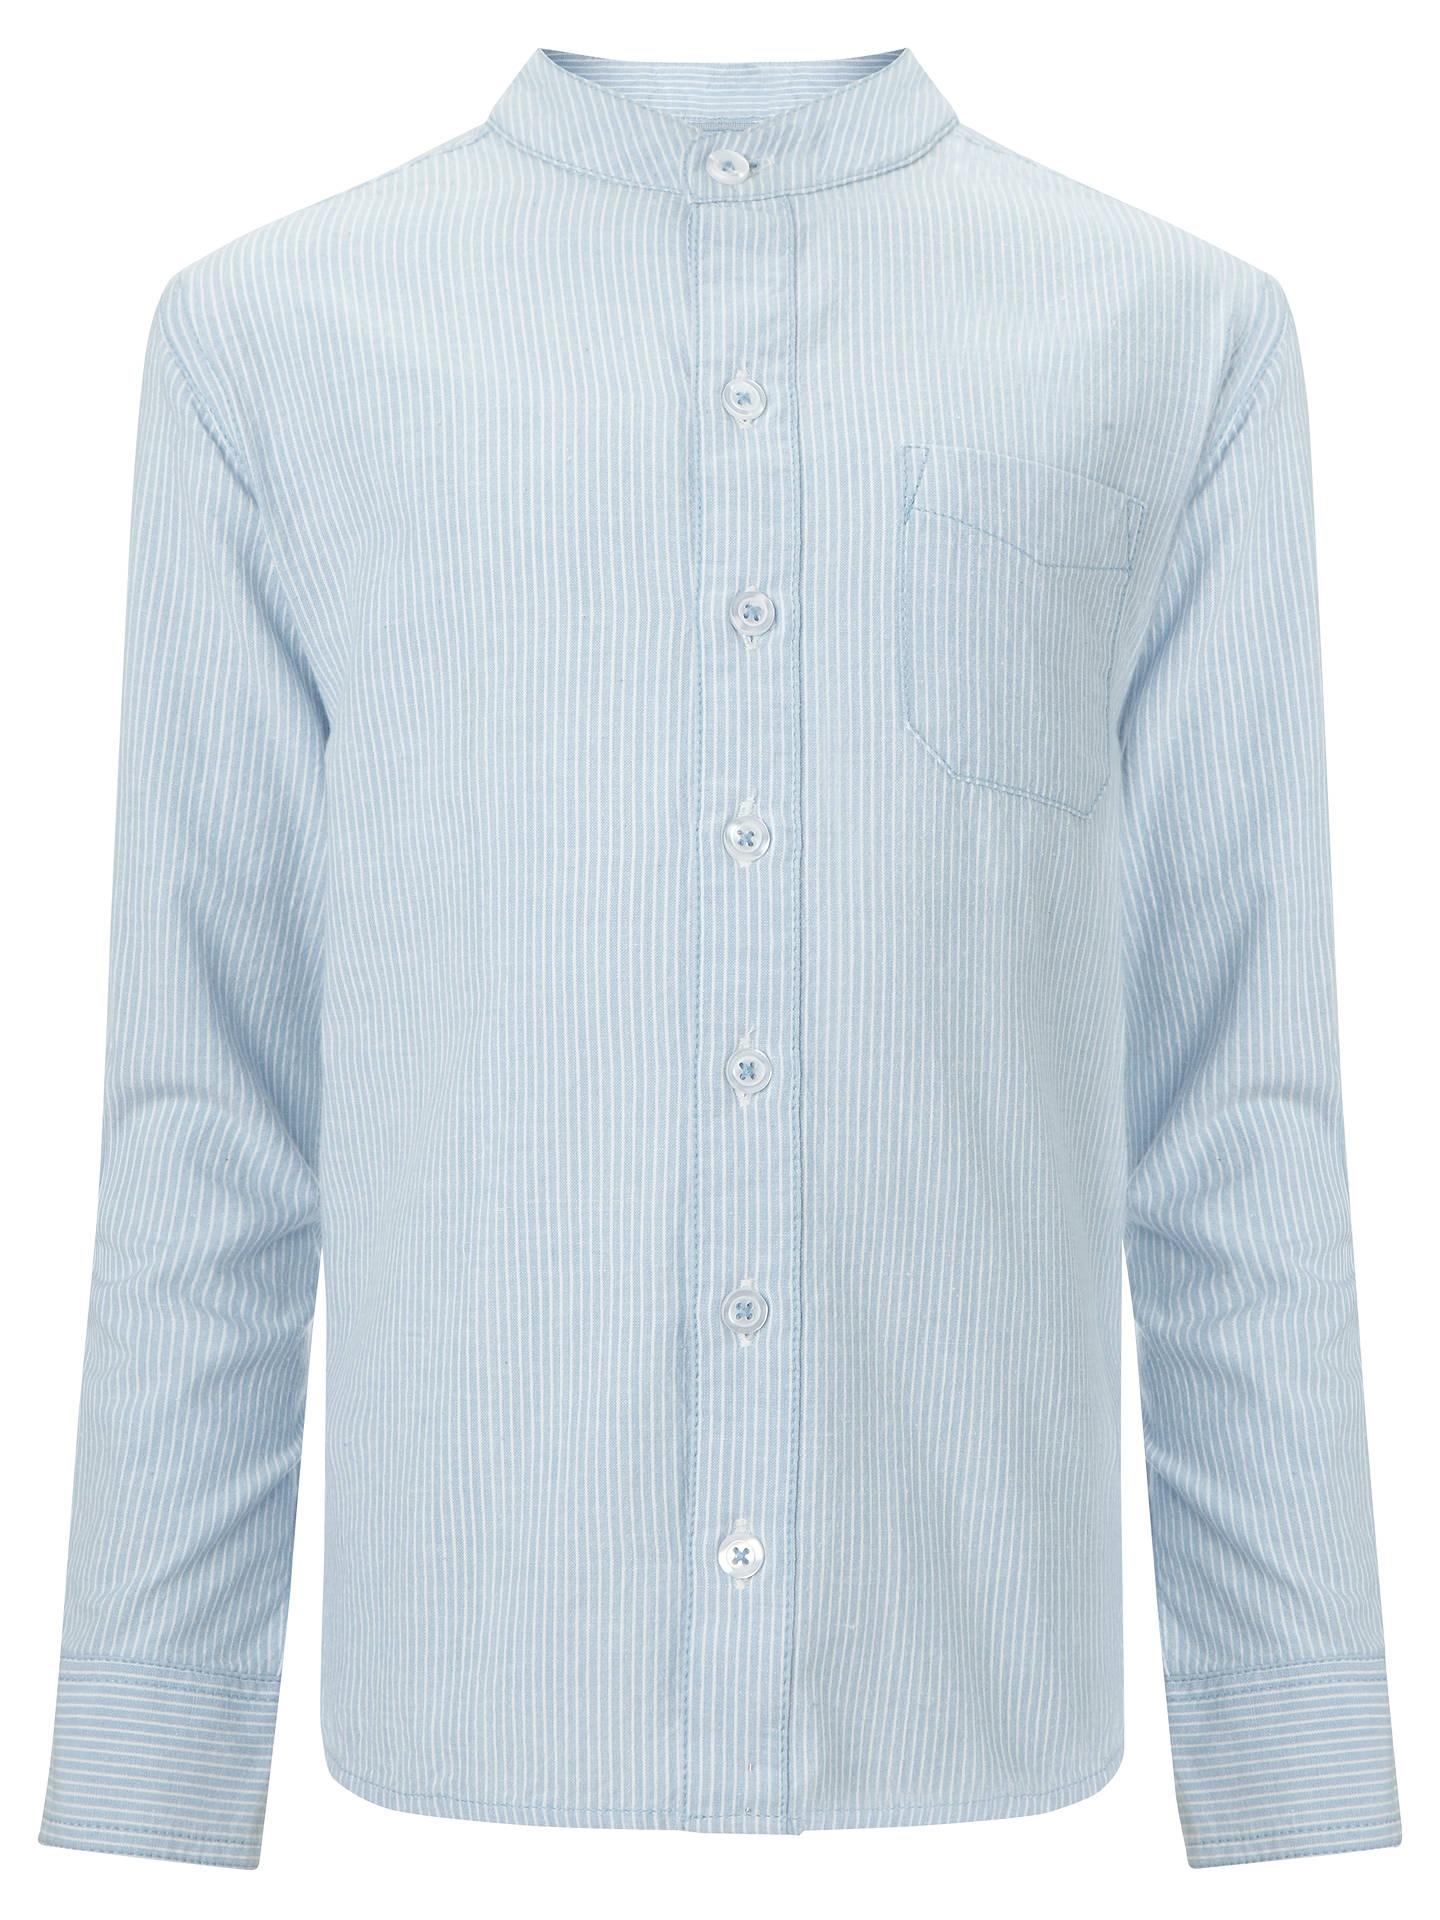 John Lewis Heirloom Collection Boys Nehru Collar Shirt Bluewhite